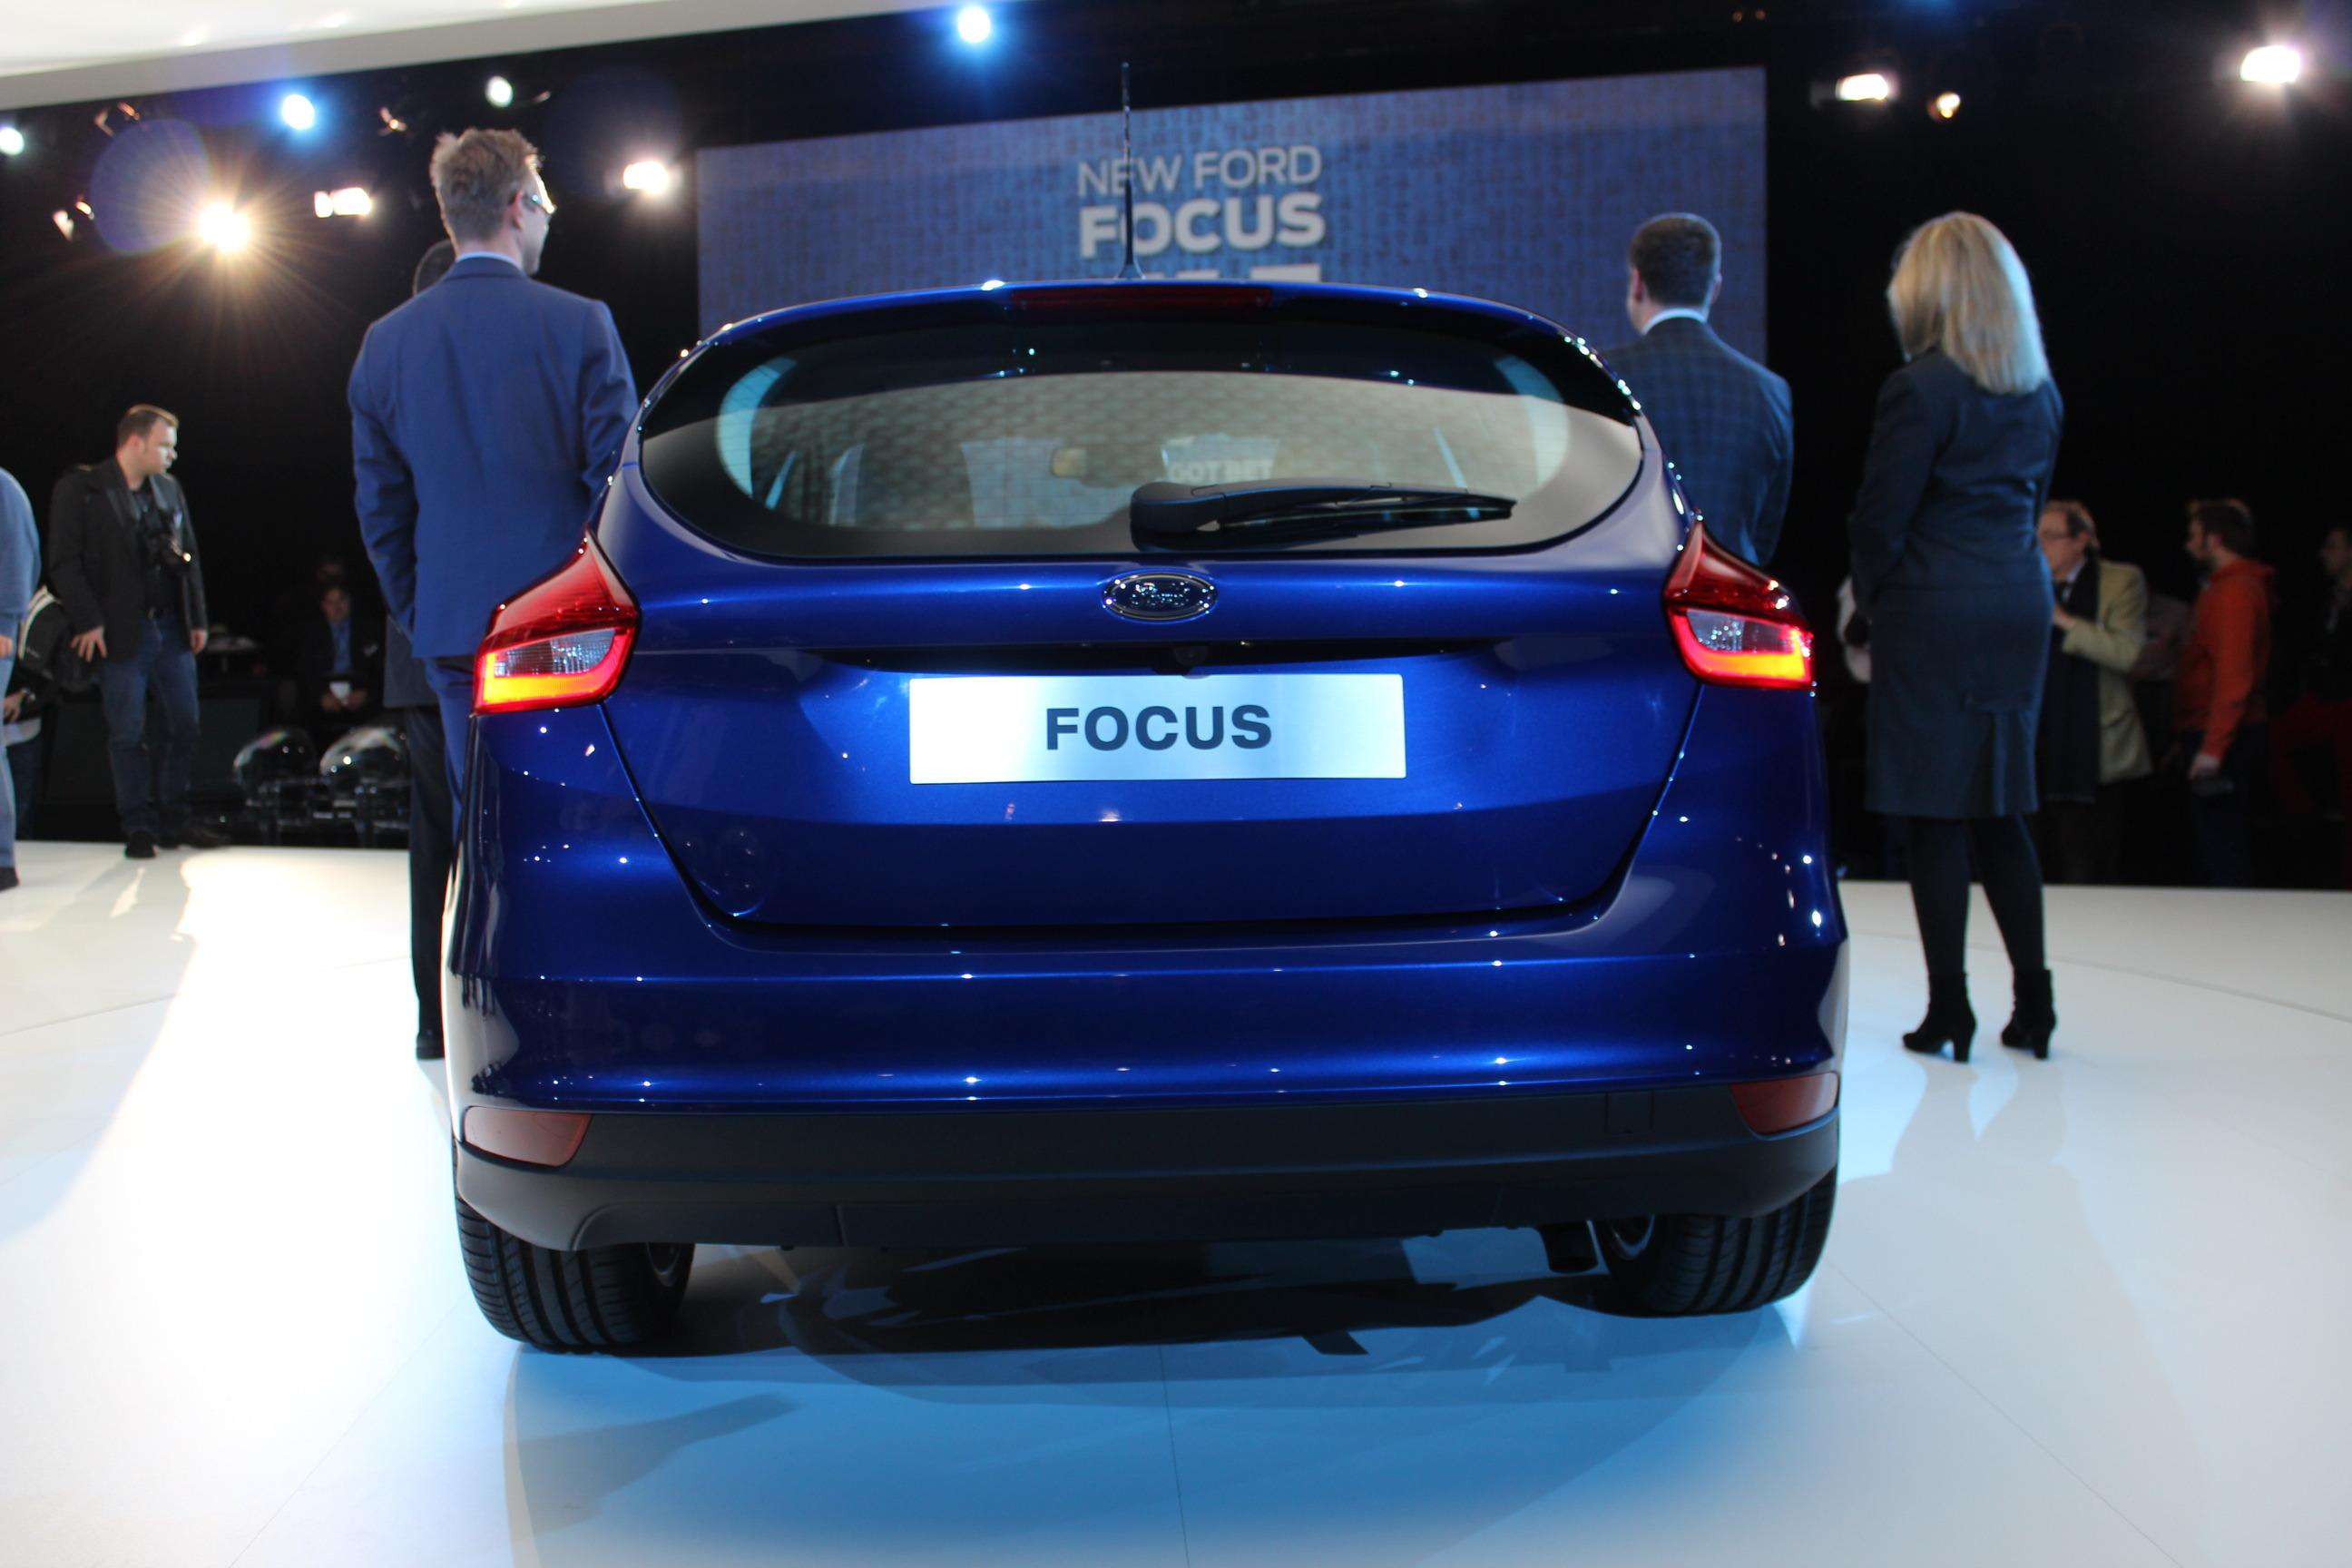 Pr 233 Sentation Vid 233 O Ford Focus 3 Restyl 233 E Meilleure En